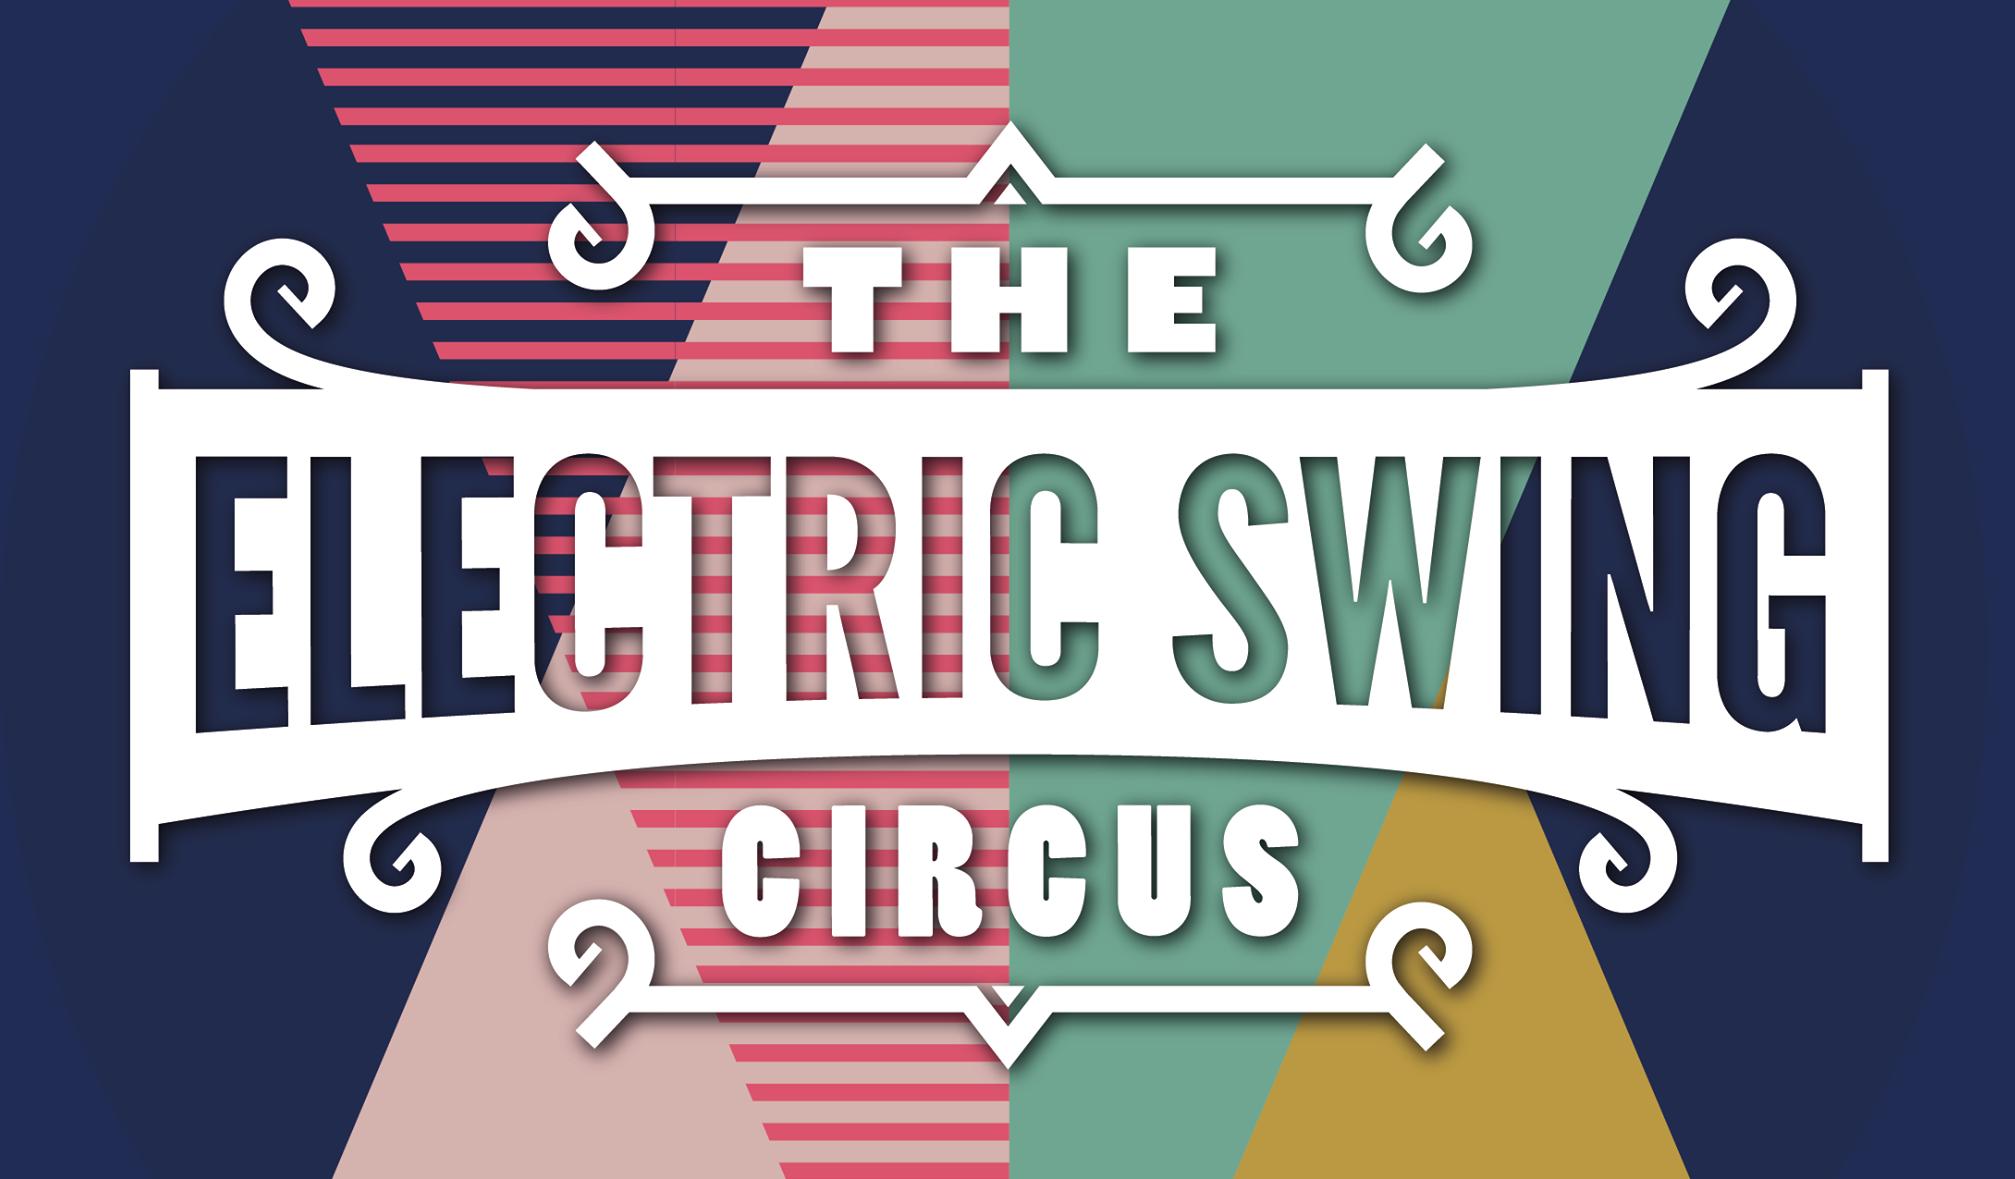 Electric Swing Circus logo.png